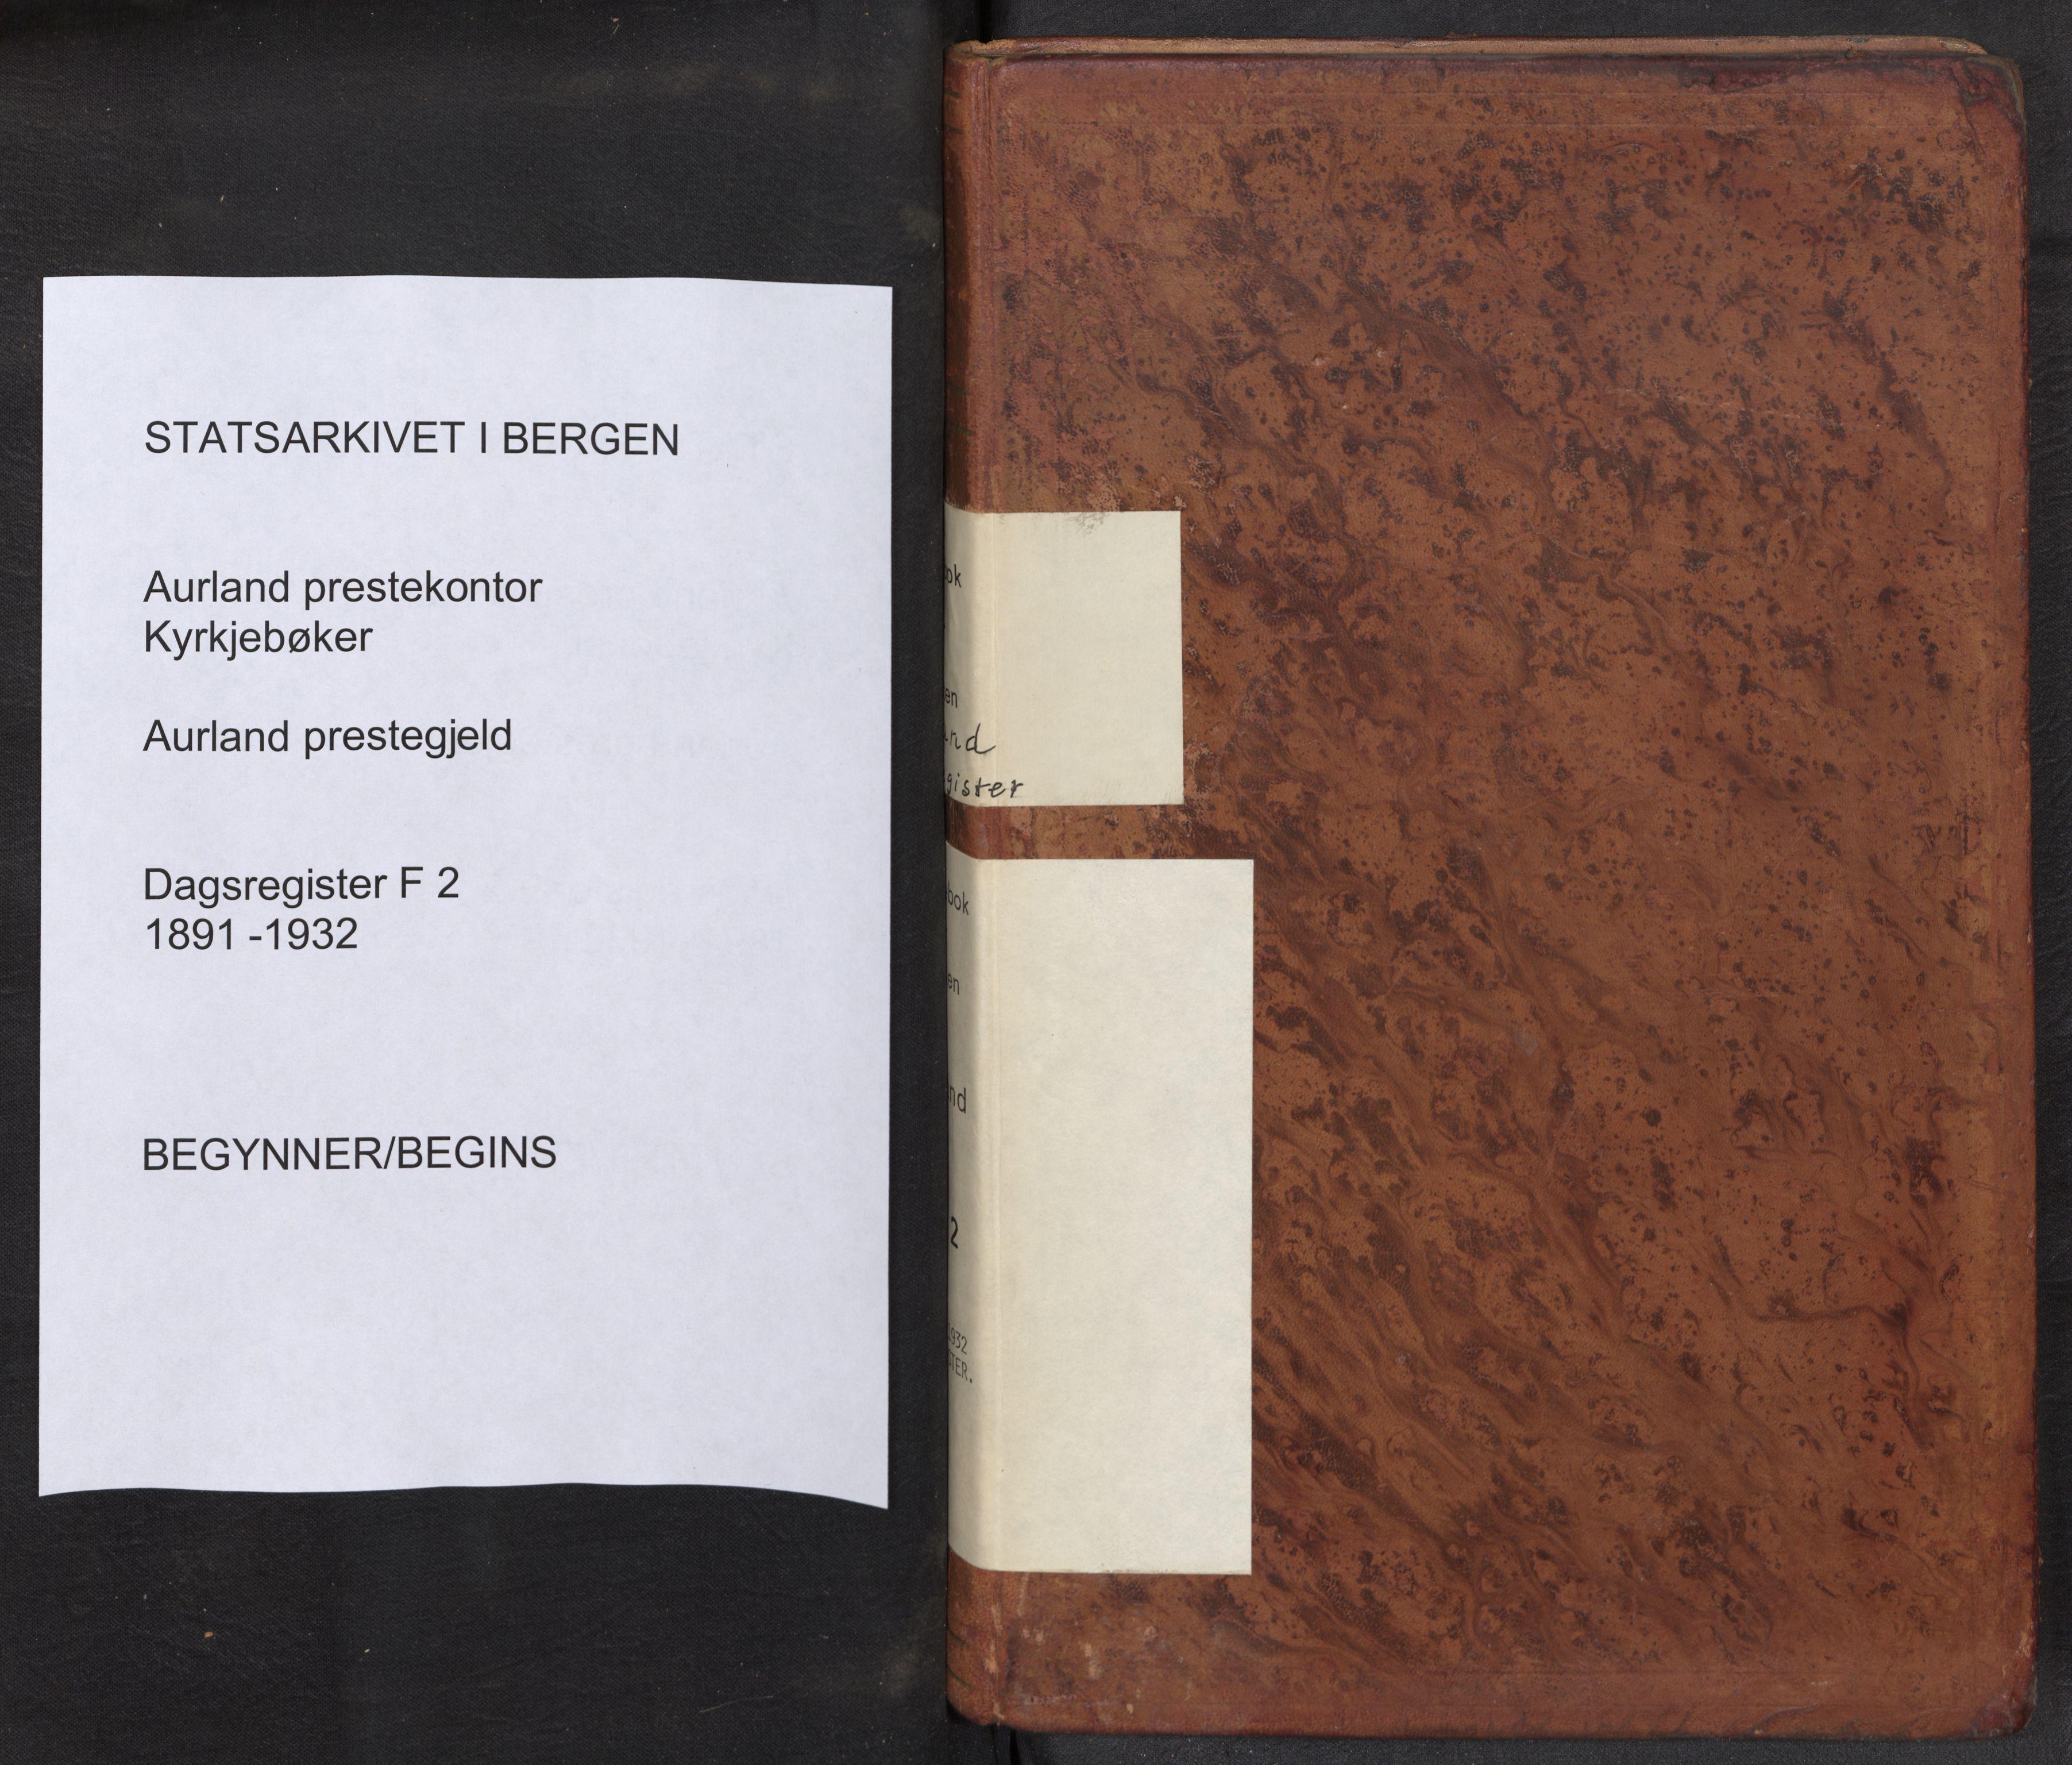 SAB, Aurland Sokneprestembete*, Dagregister nr. F 2, 1891-1932